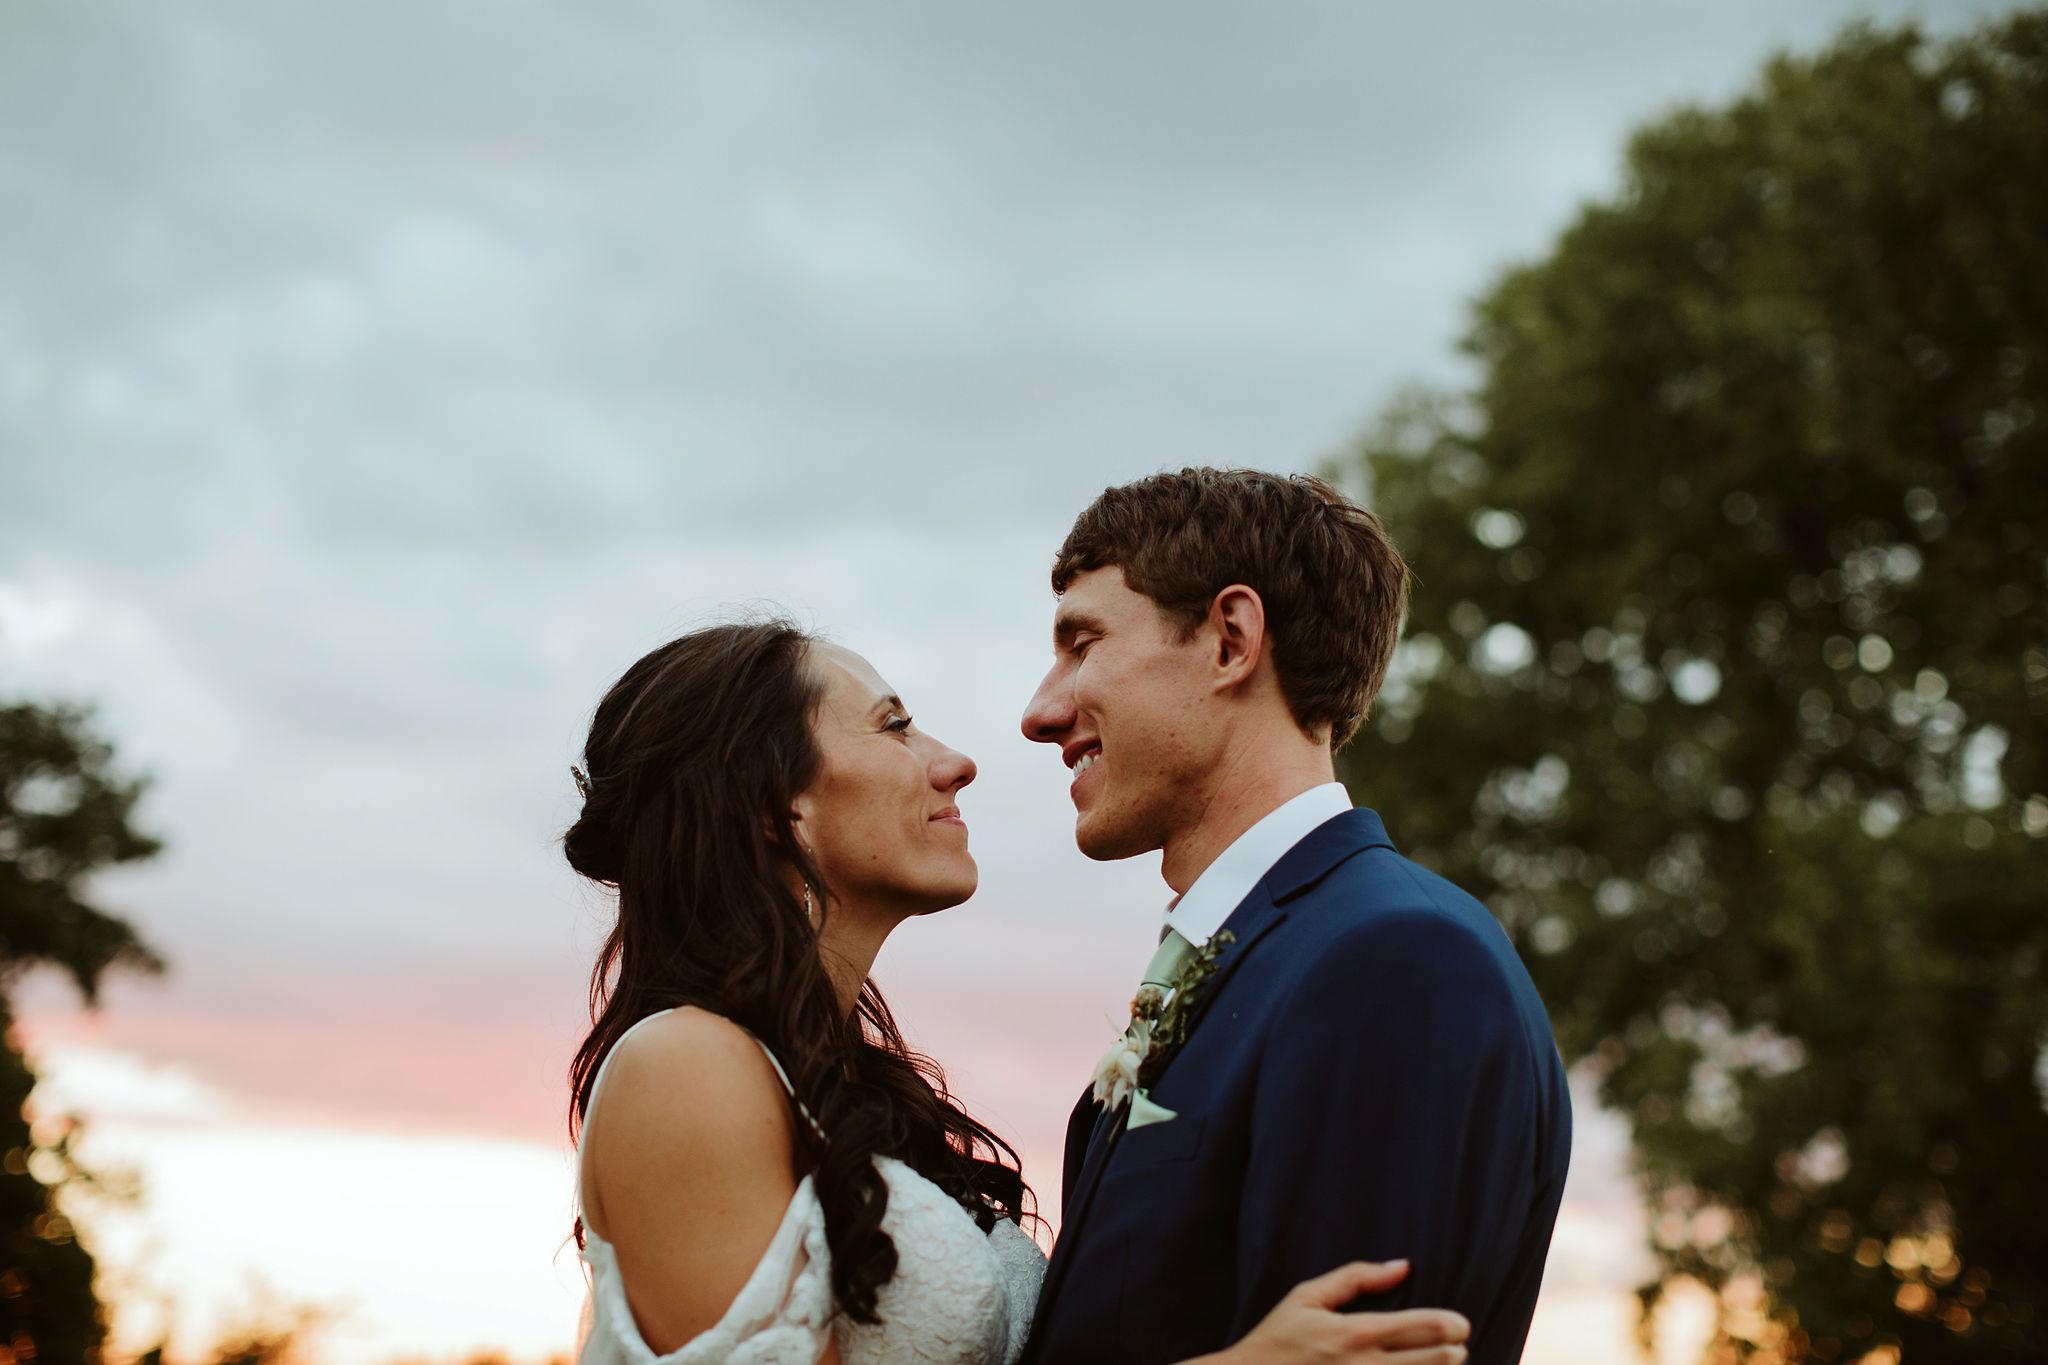 Cure of Ars and Twenty Three Event Space Station Room Wedding_Cinder Block Brewery Wedding_Kindling Wedding Photography_02.JPG